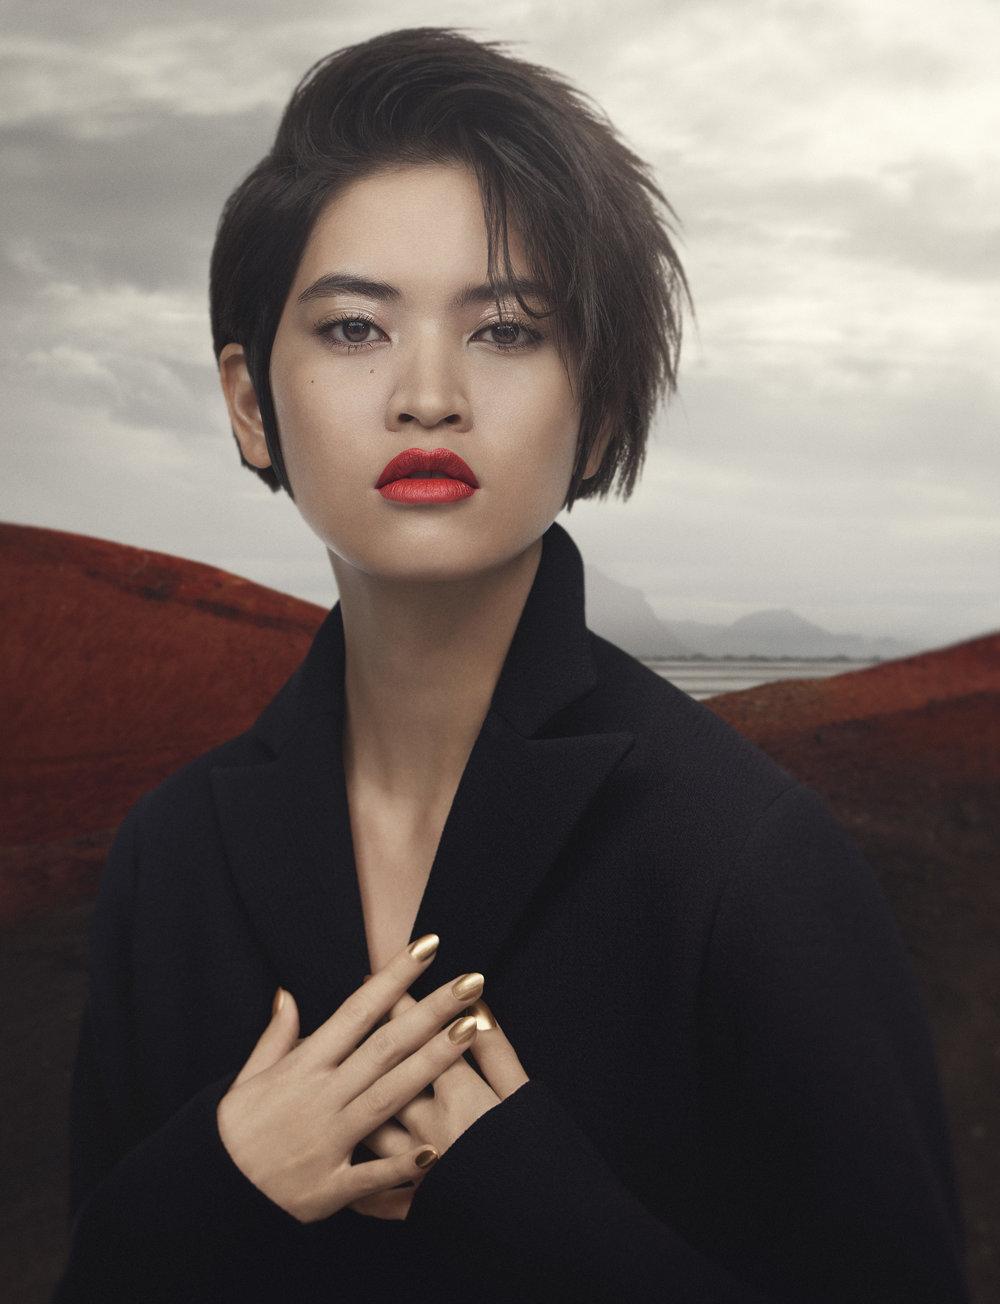 Dior Beauty - George McLeod